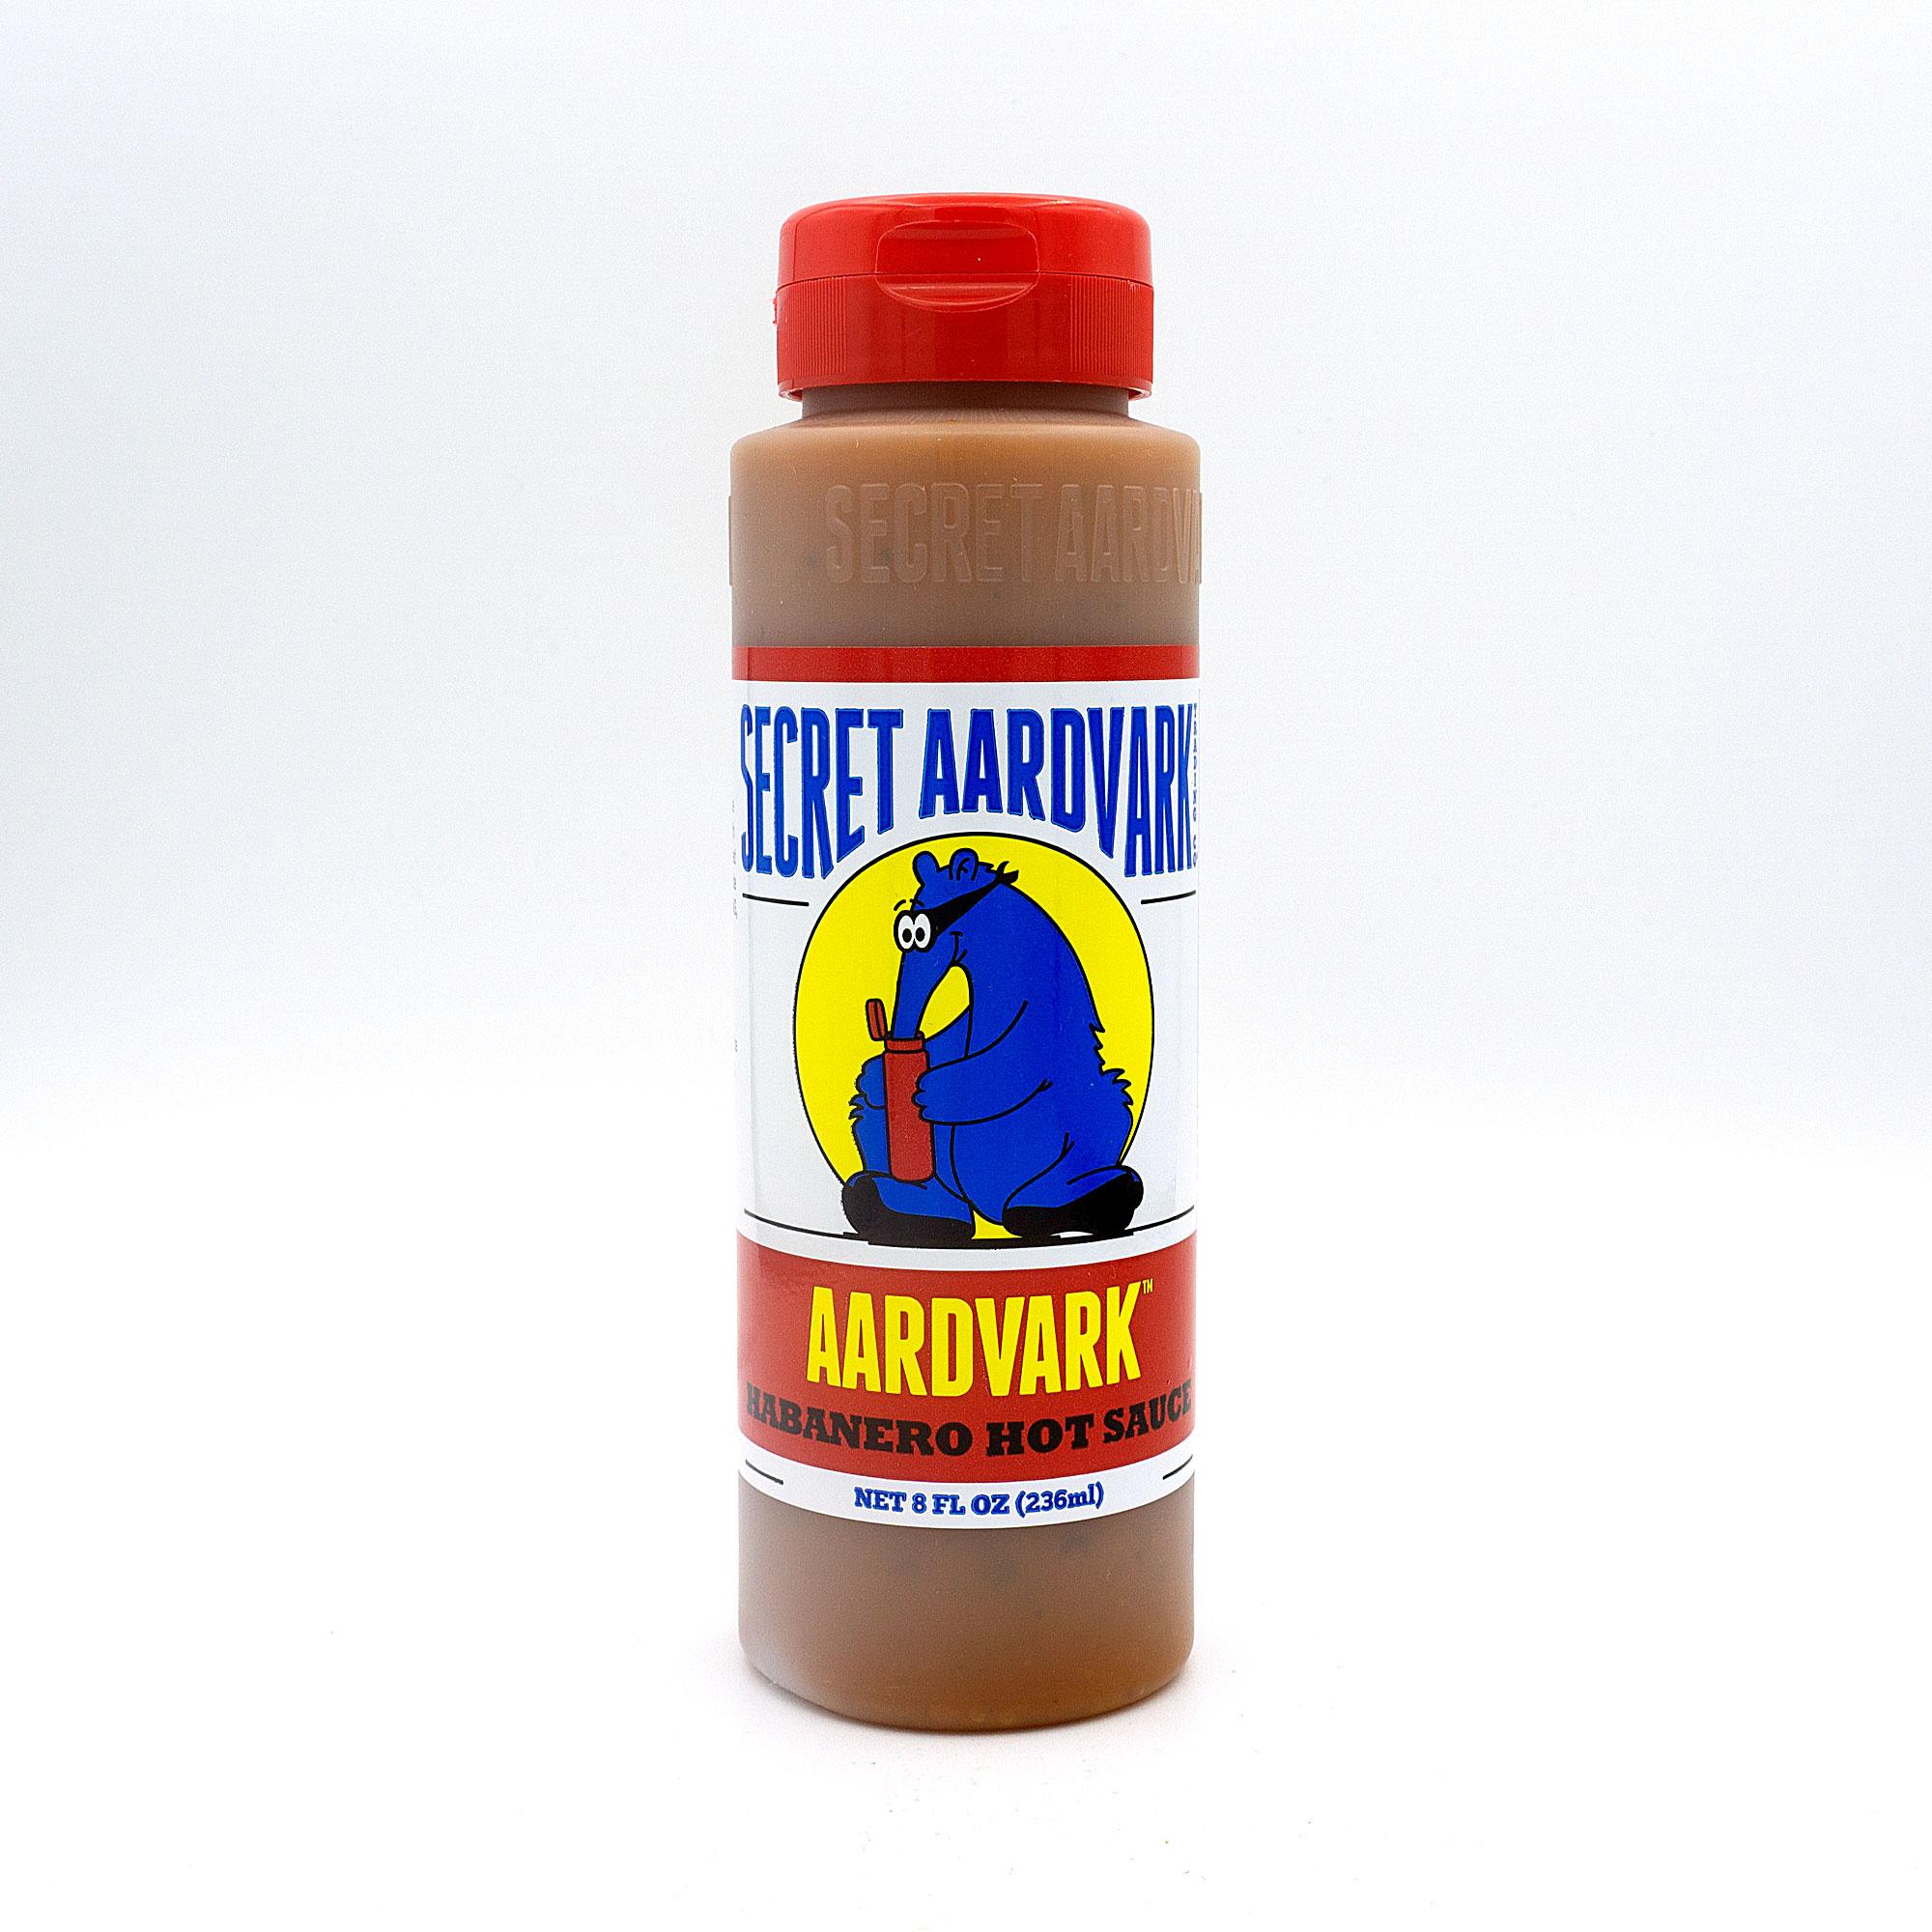 Secret Aardvark - Habanero Hot Sauce | Mat's Hot Shop